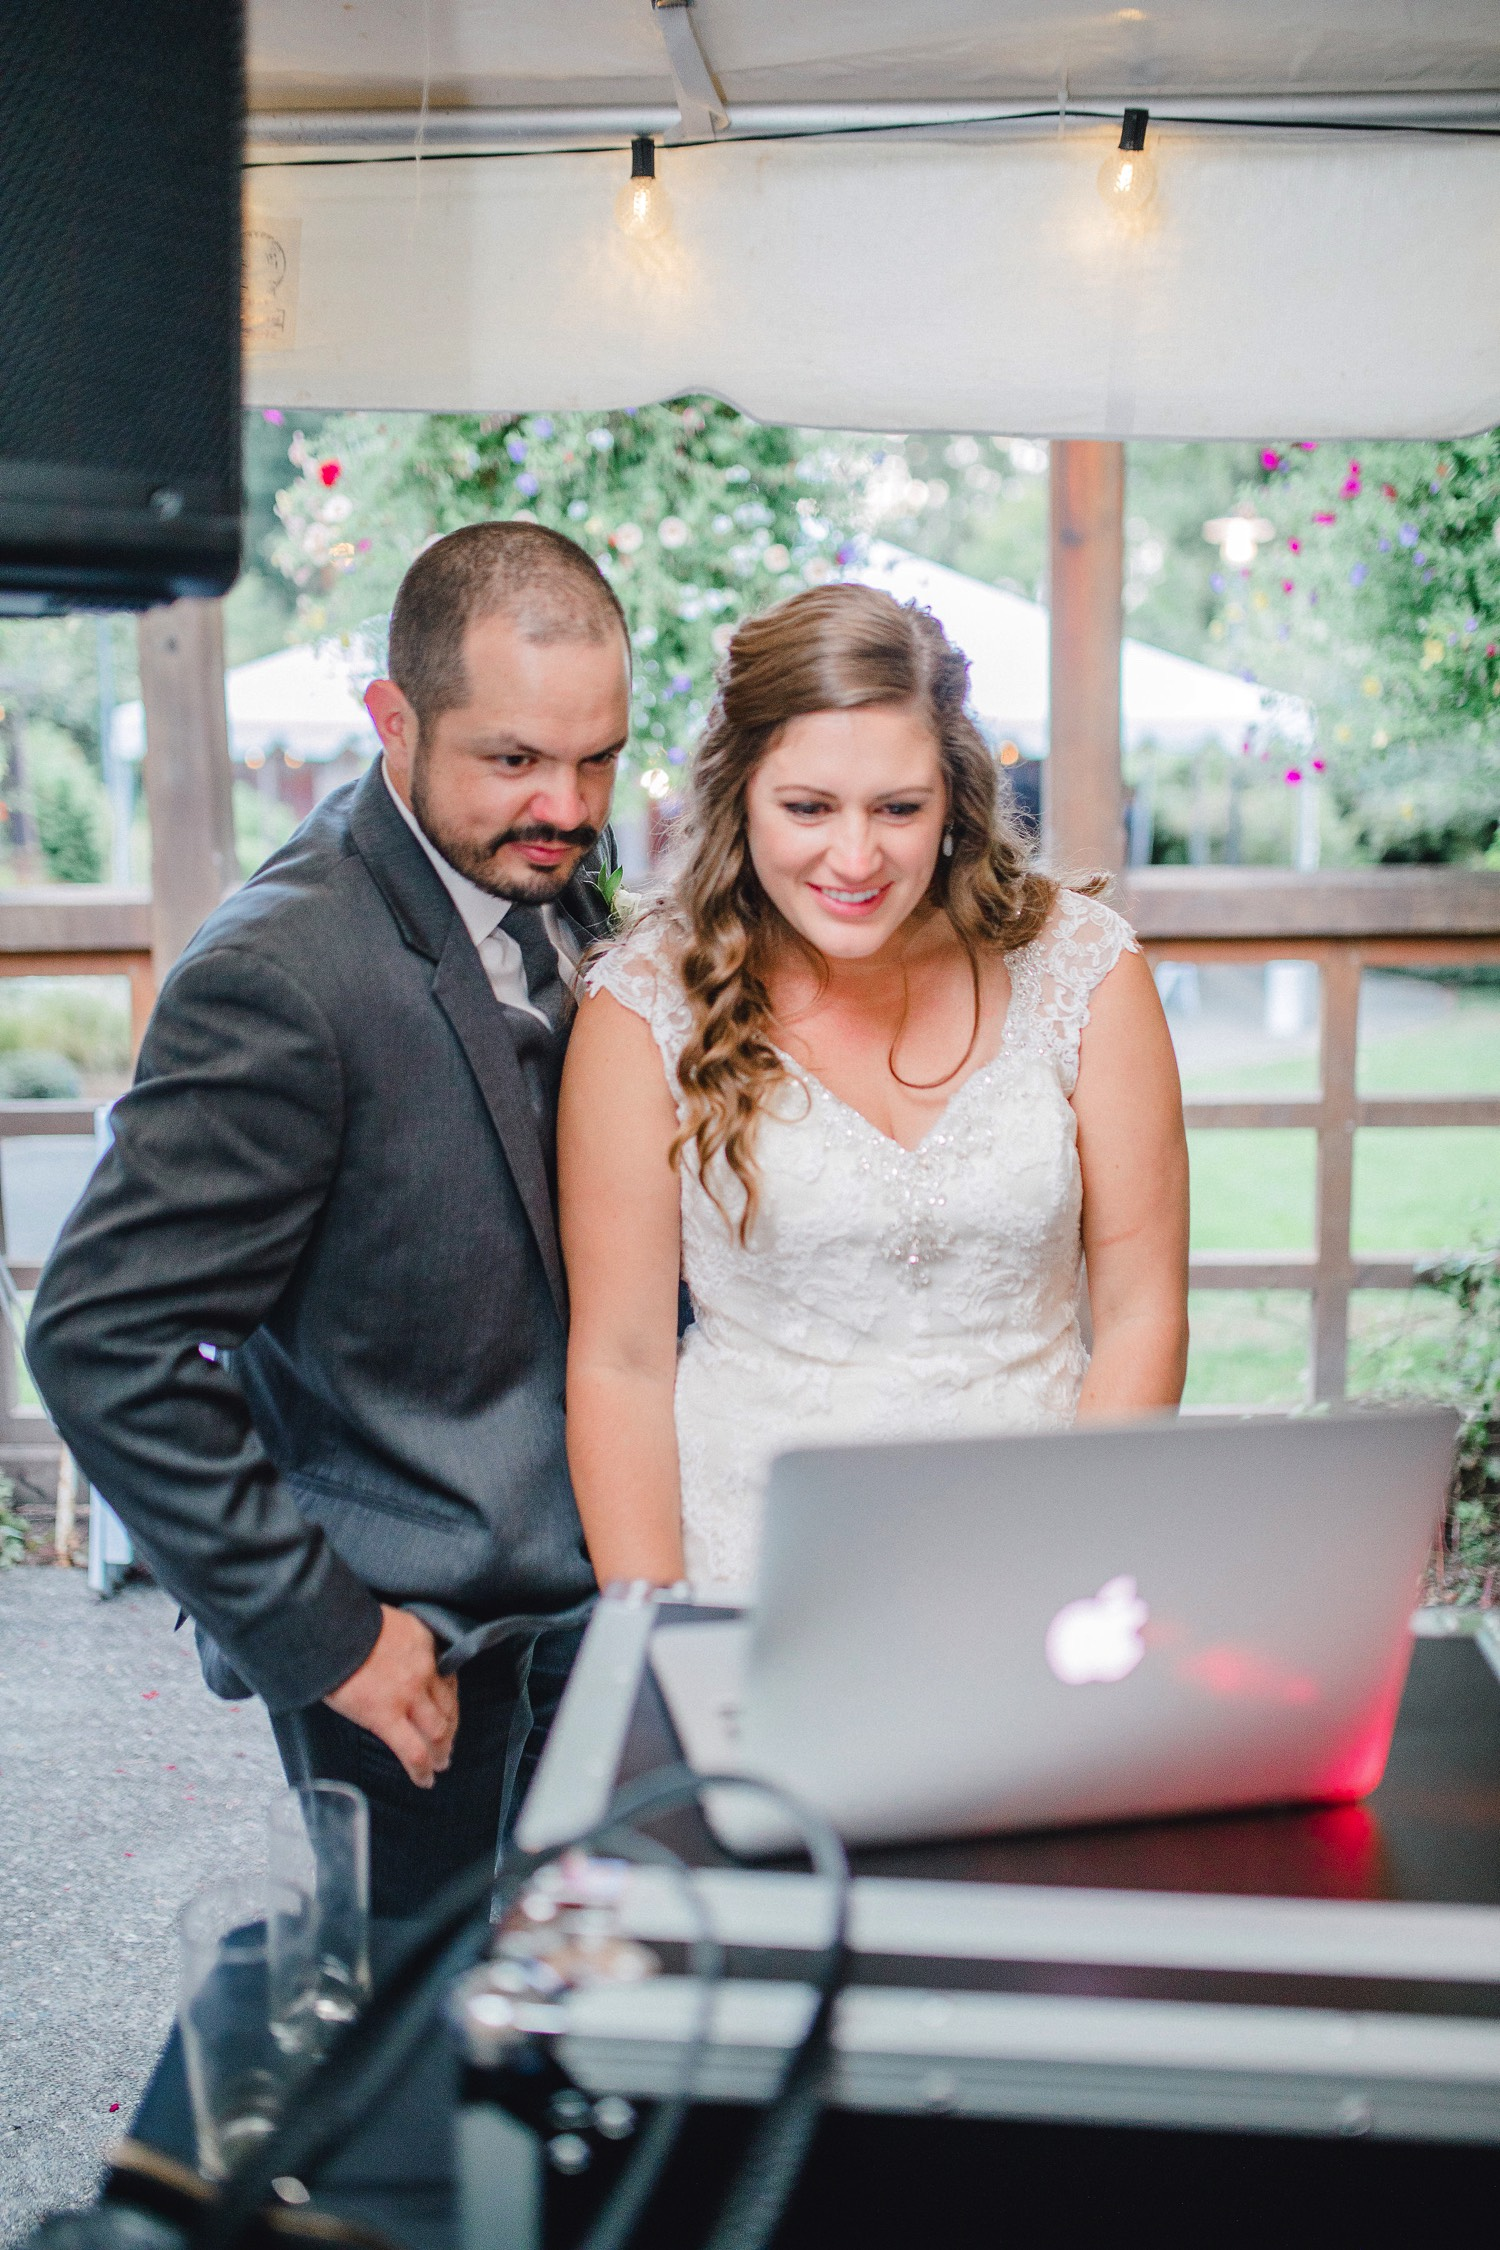 0000000000102_emmarosecompany_katiematt-4541_Photographer_PNW_House_Robinswood_Emma_Light_Company_Airy_Rose_and_Wedding_Seattle.jpg